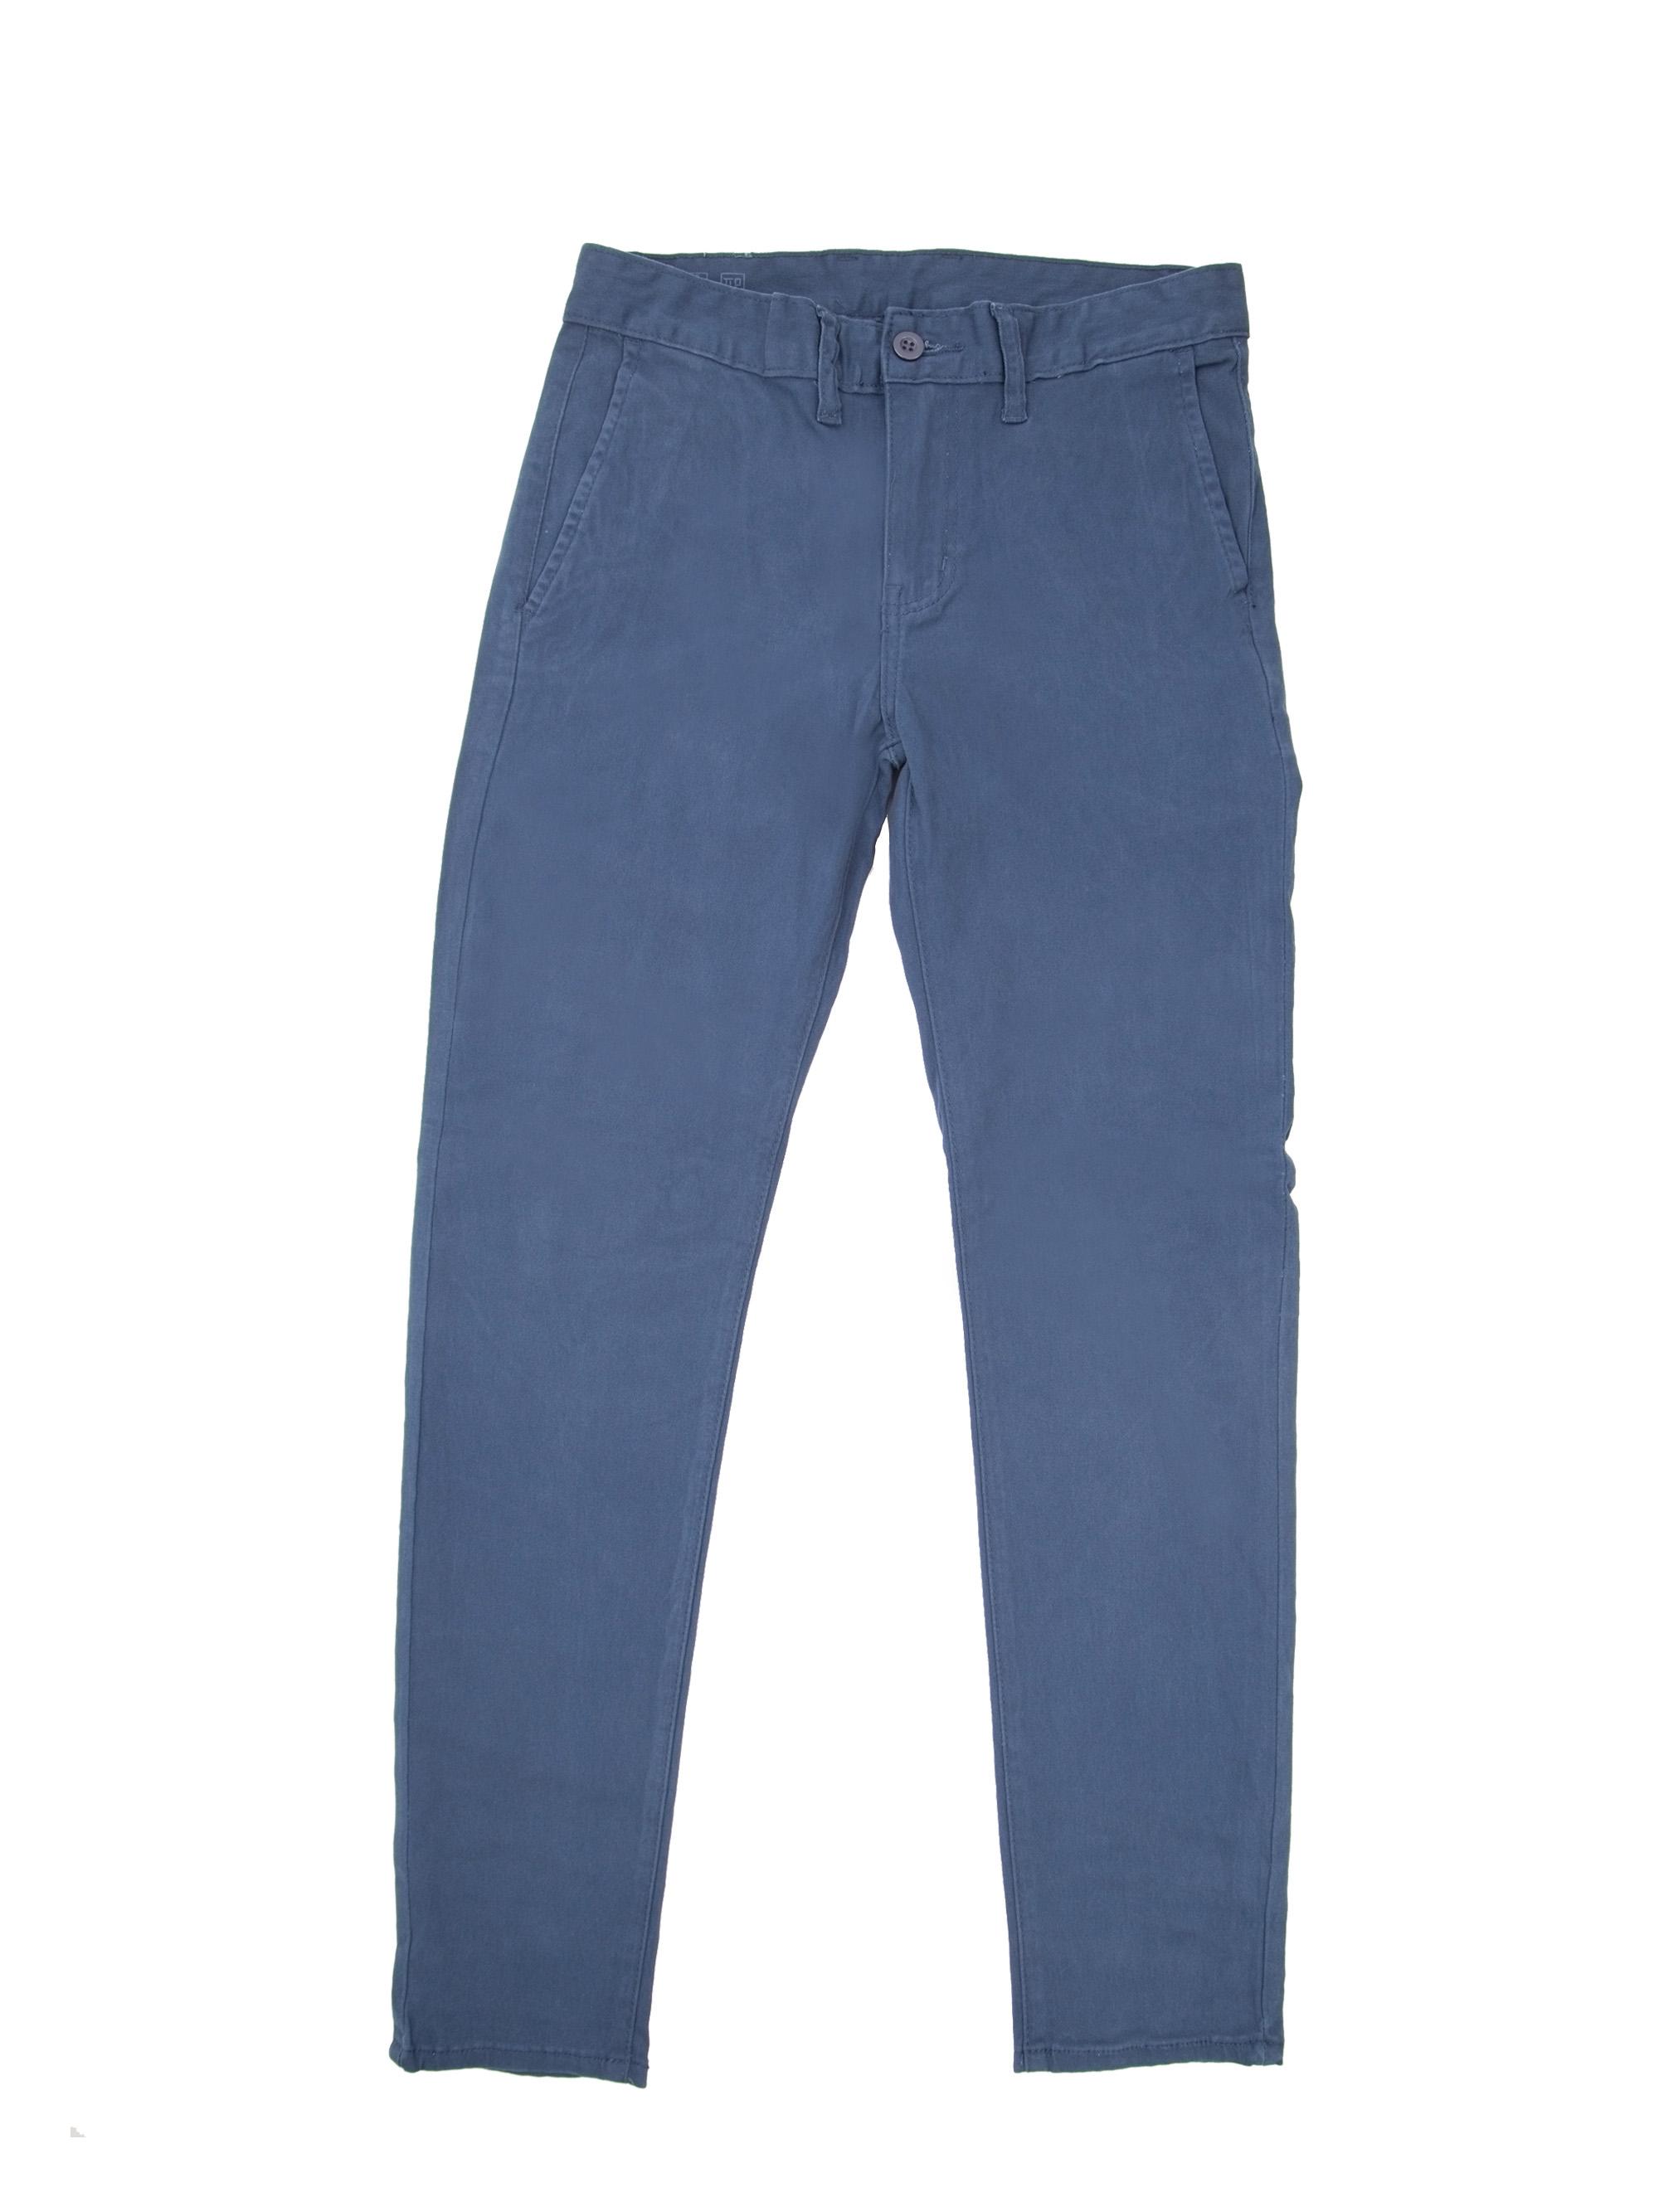 634f54aba TLP Pantalón Vestir Hombre Slim Azul